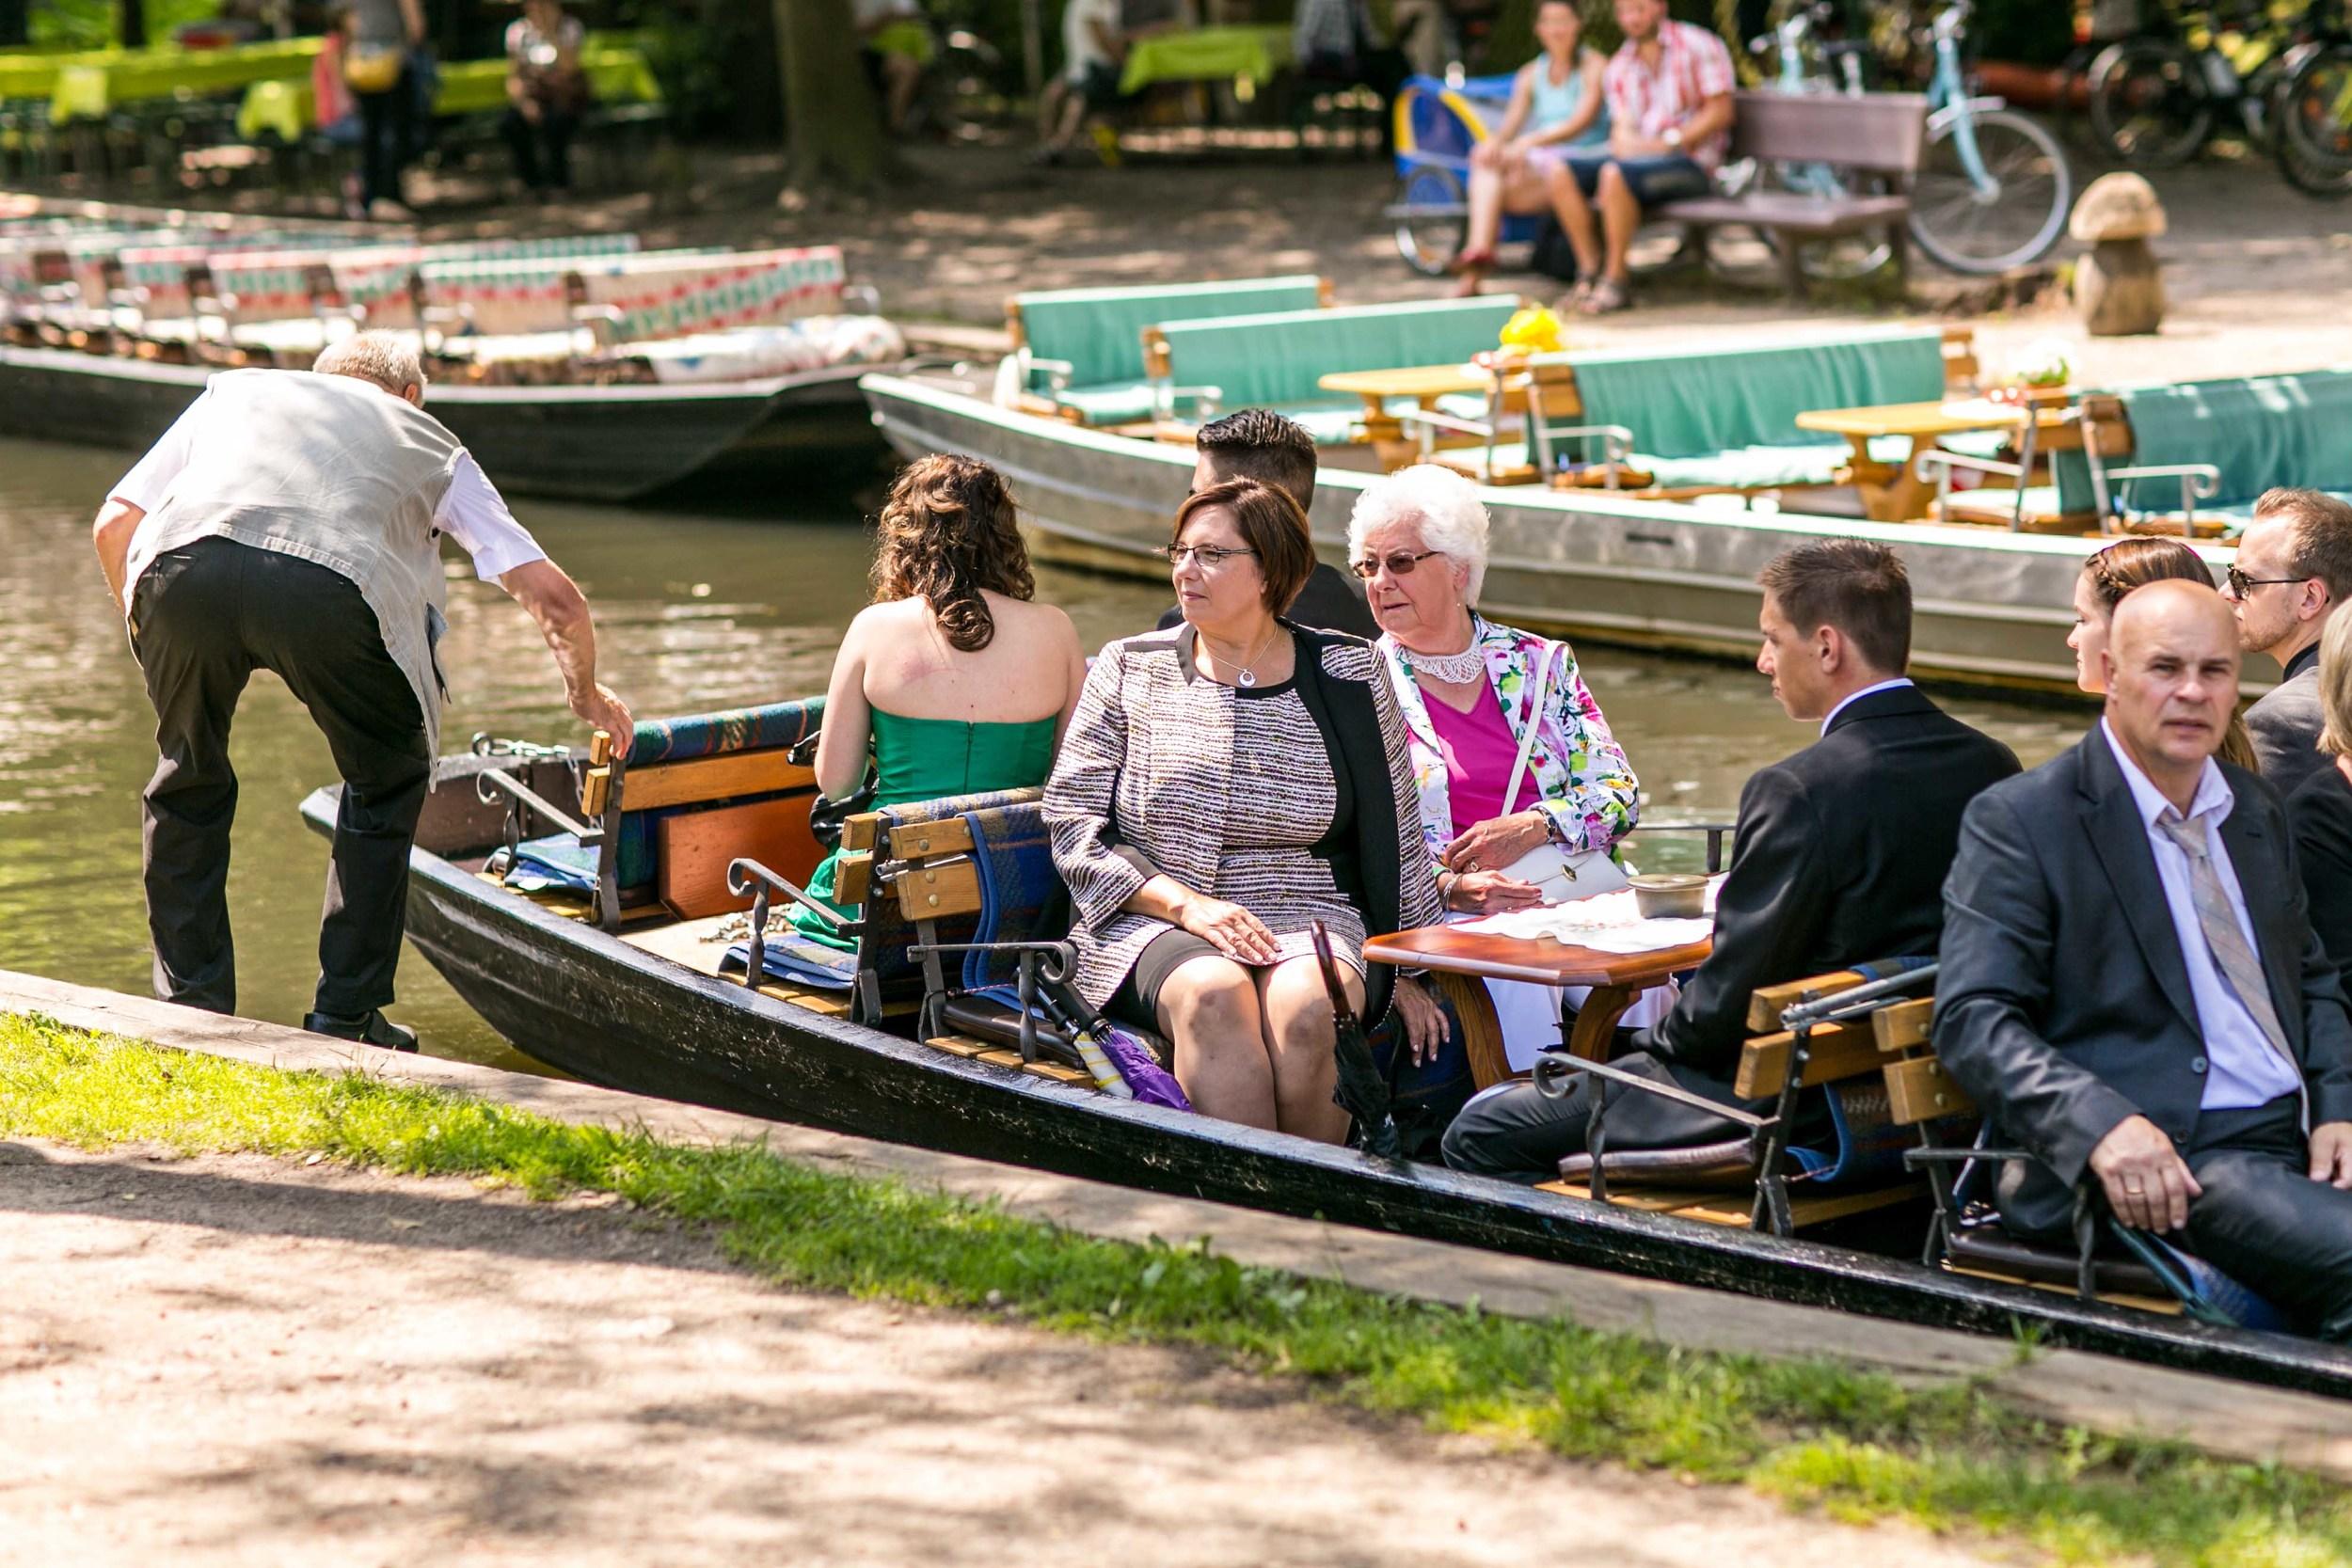 Spreewald Hochzeitsfotografie_Fran Burrows Fotografie-7.jpg